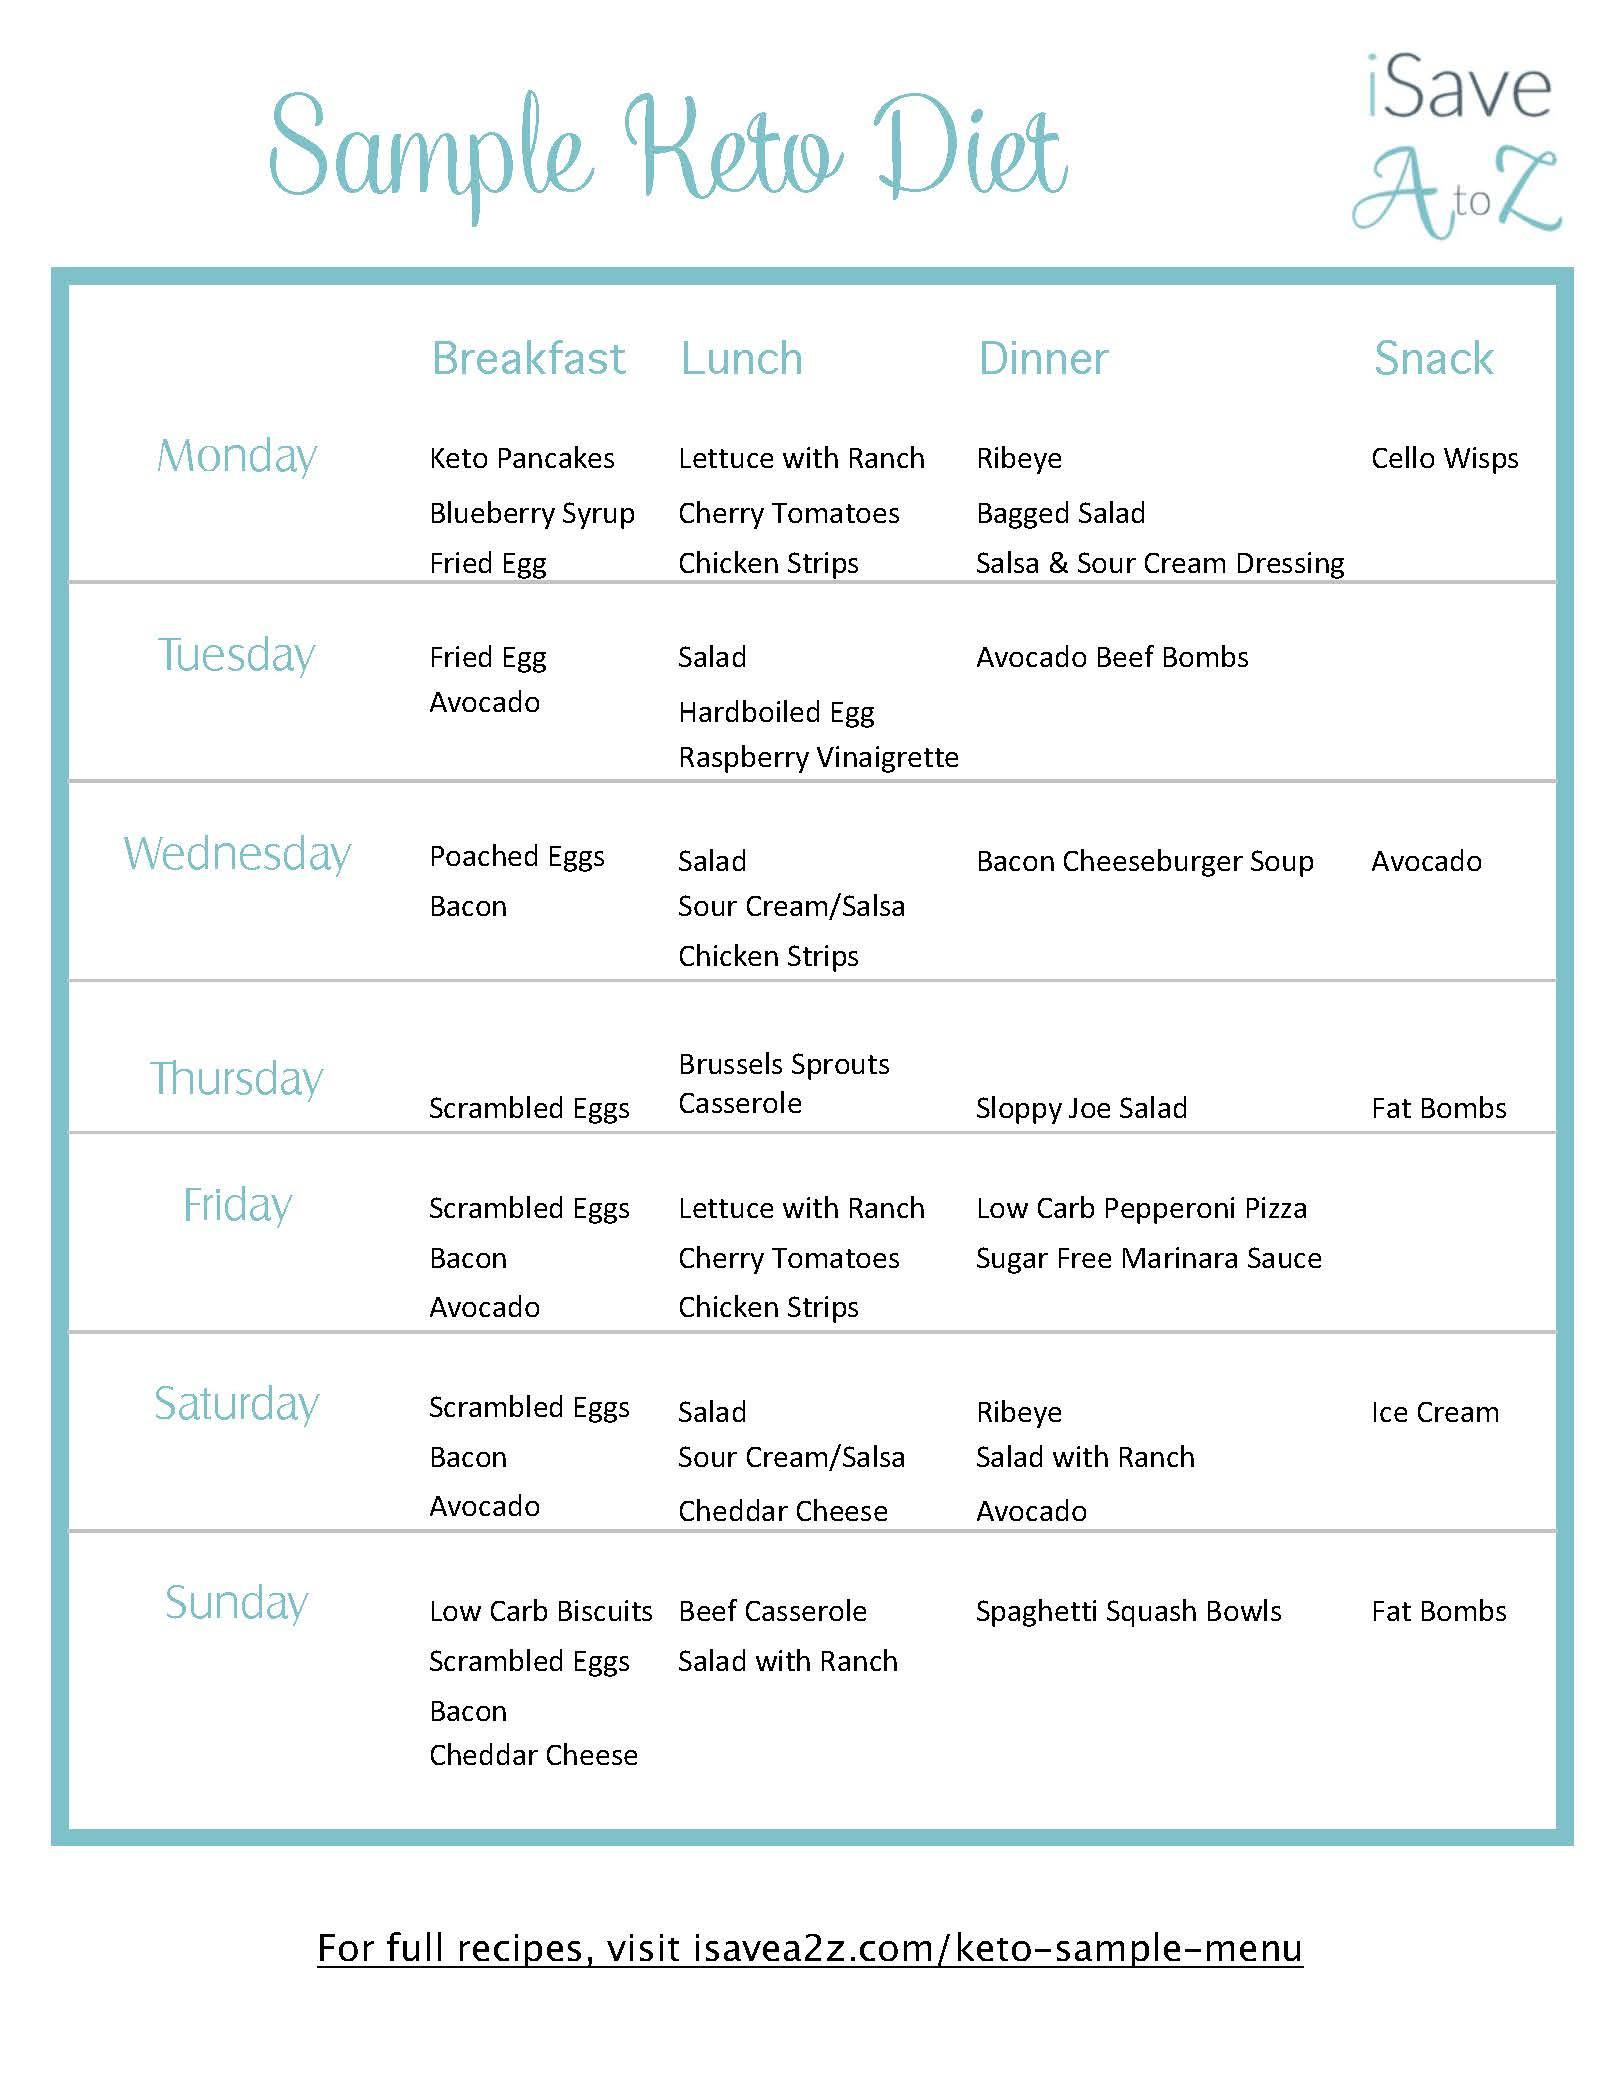 Free Keto Diet Recipes  Keto Sample Menu 7 Day Plan iSaveA2Z